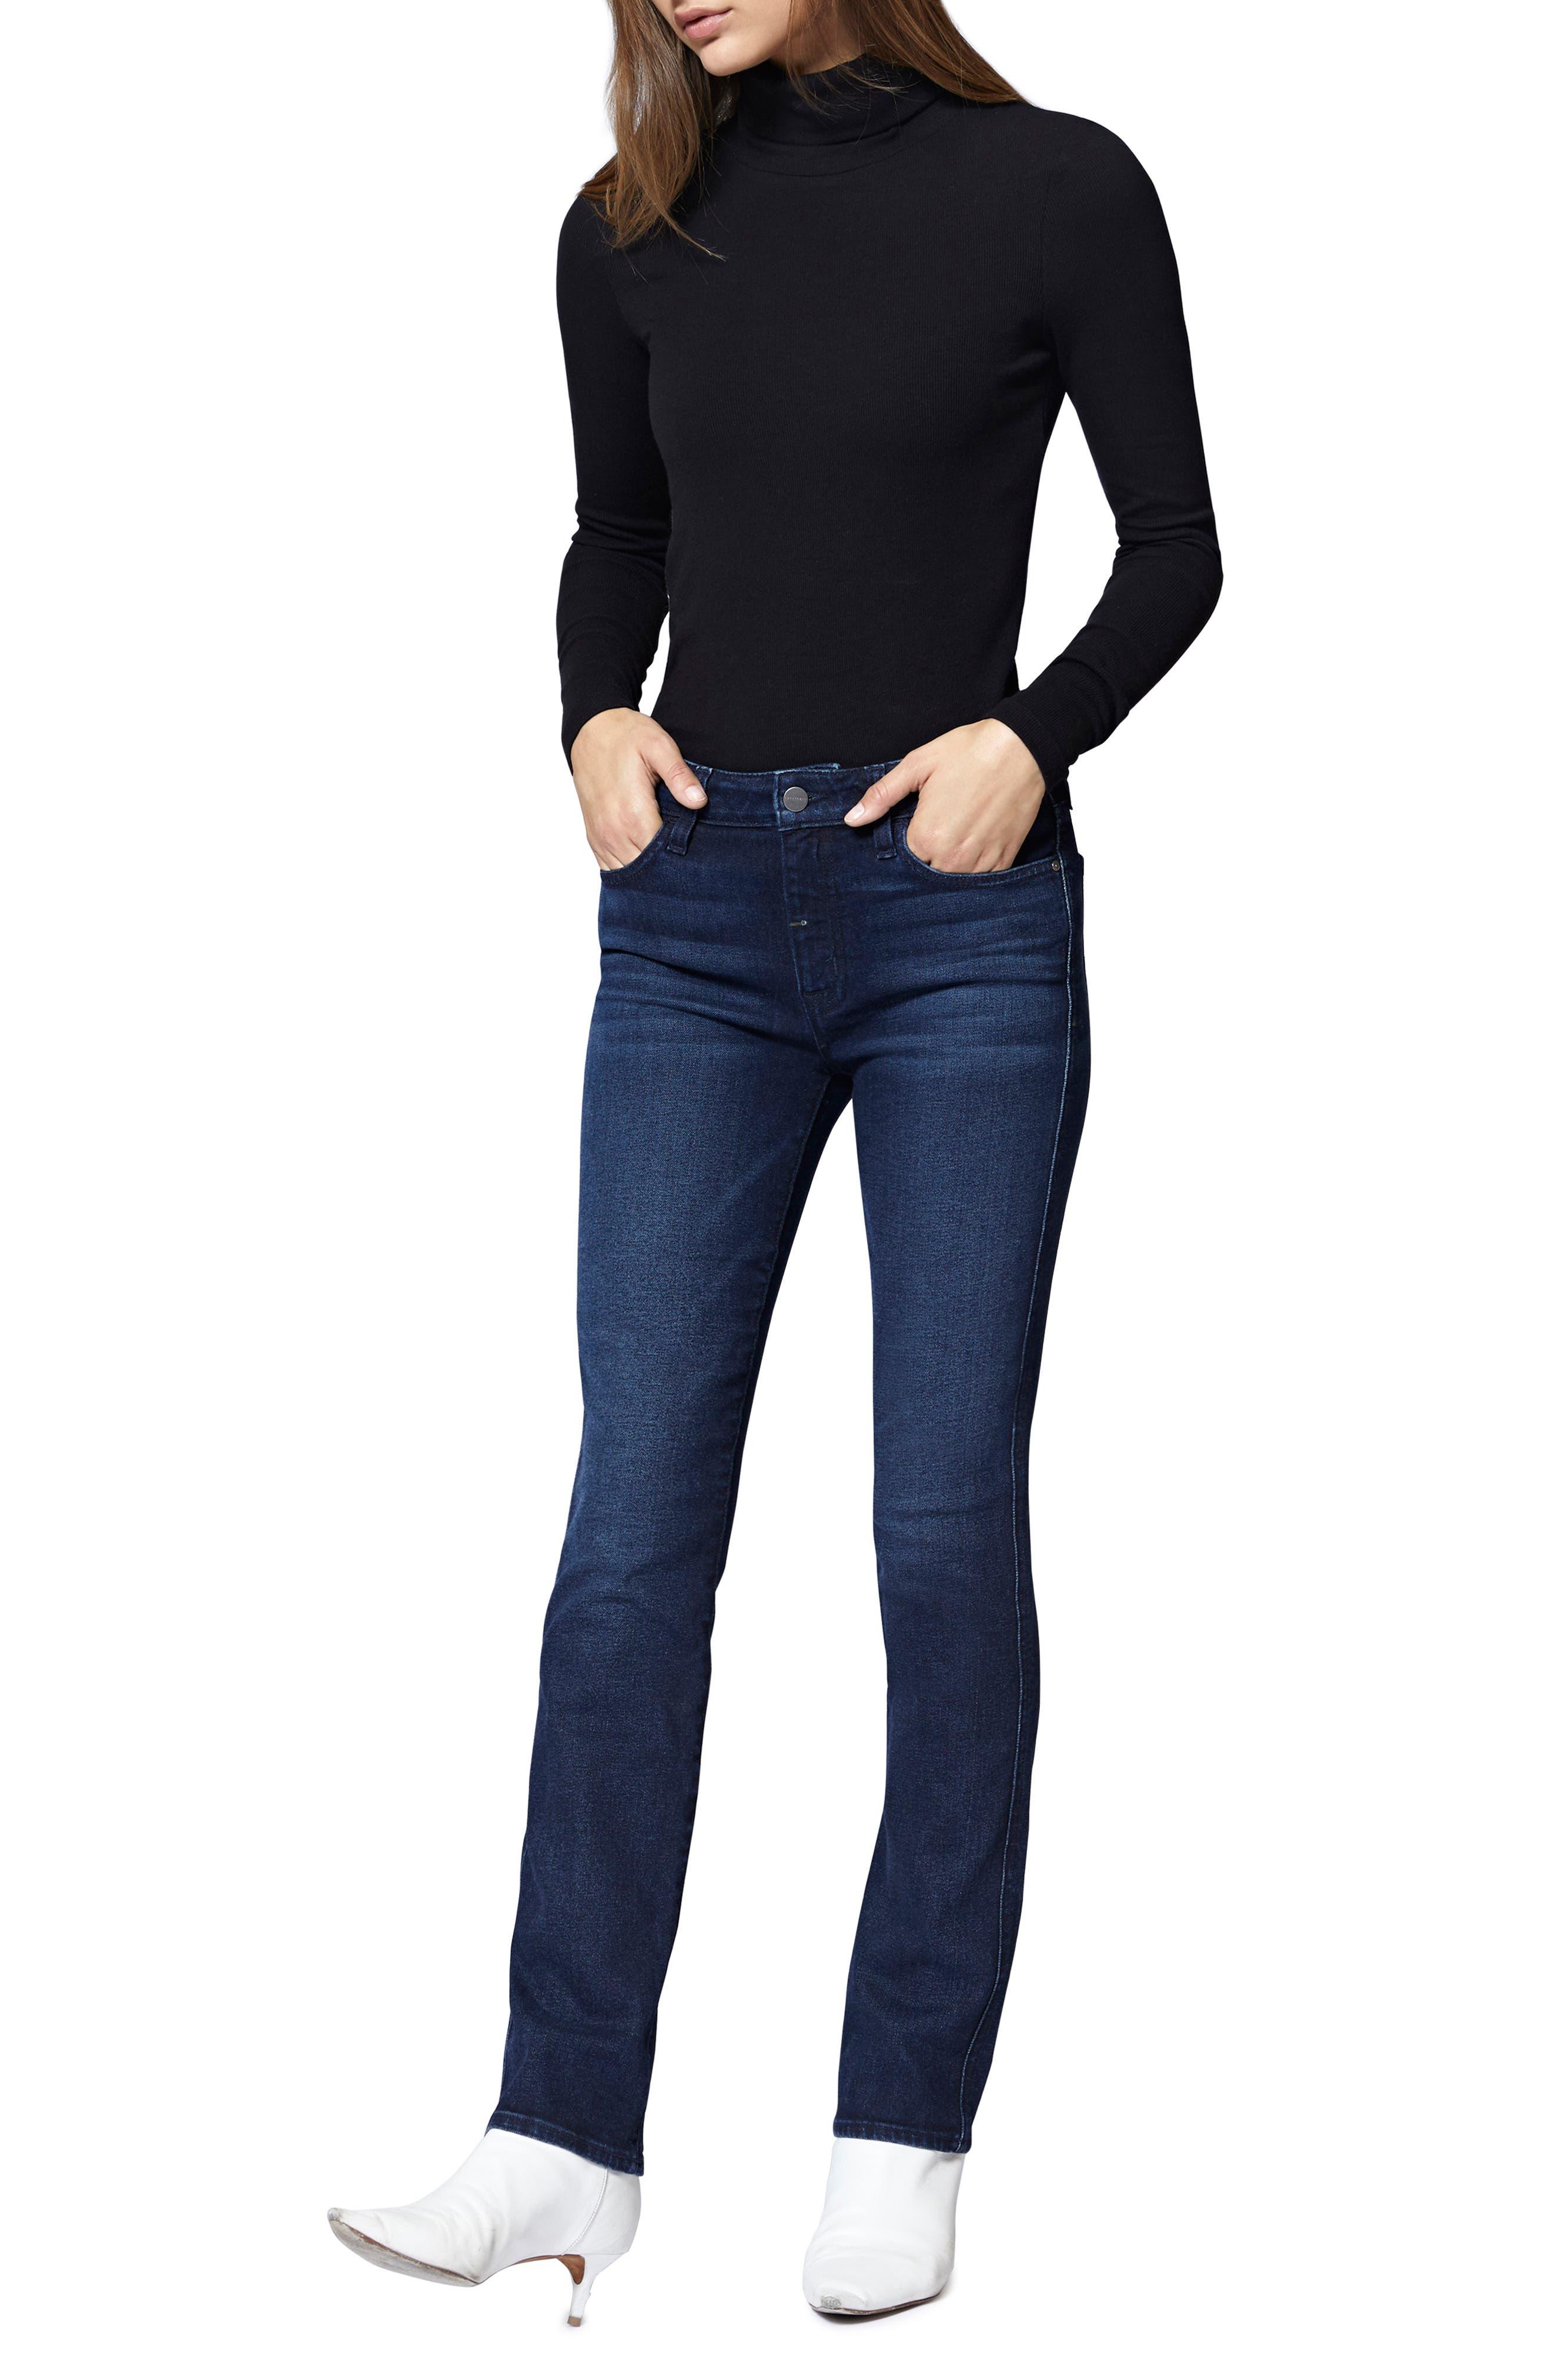 SANCTUARY,                             Social High Rise Raw Hem Skinny Ankle Jeans,                             Alternate thumbnail 6, color,                             401